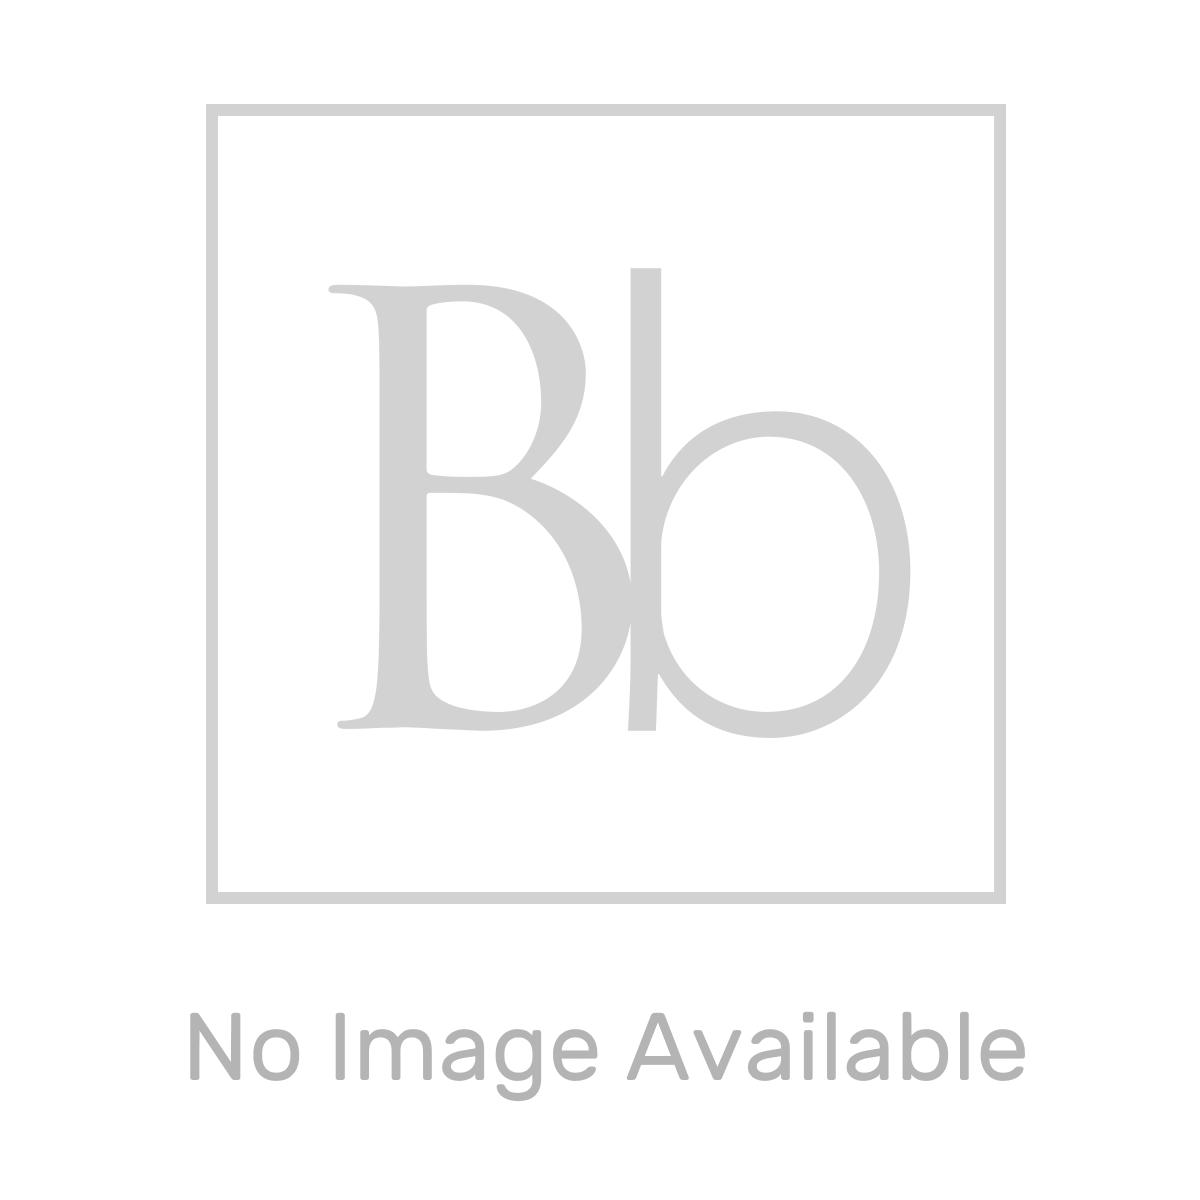 RAK Feeling Black Rectangular Shower Tray 1200 x 800mm Measurements